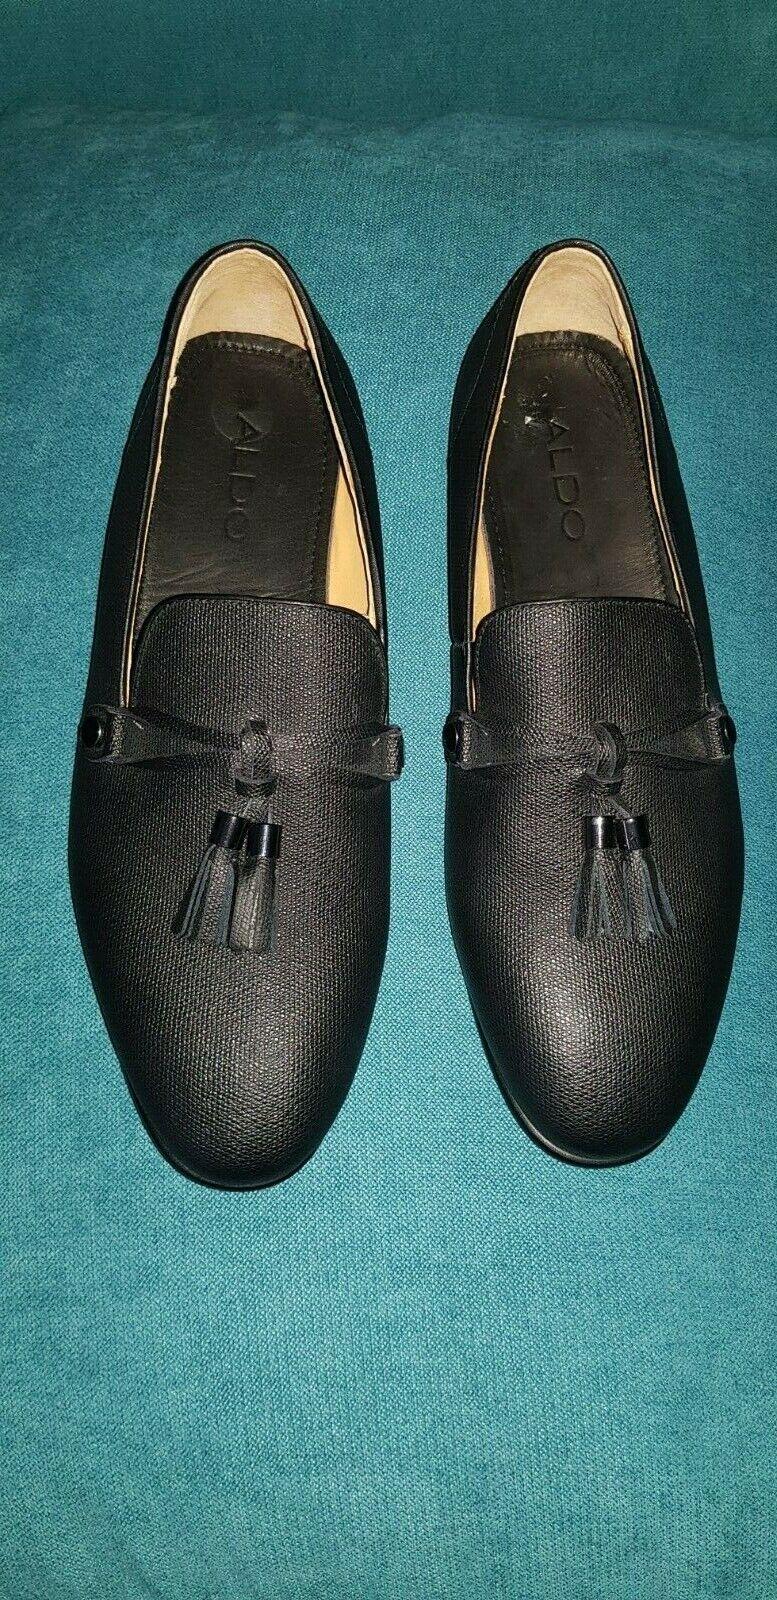 ALDO Herren Schuhe Business Leder Schuhe Schnürer   eBay